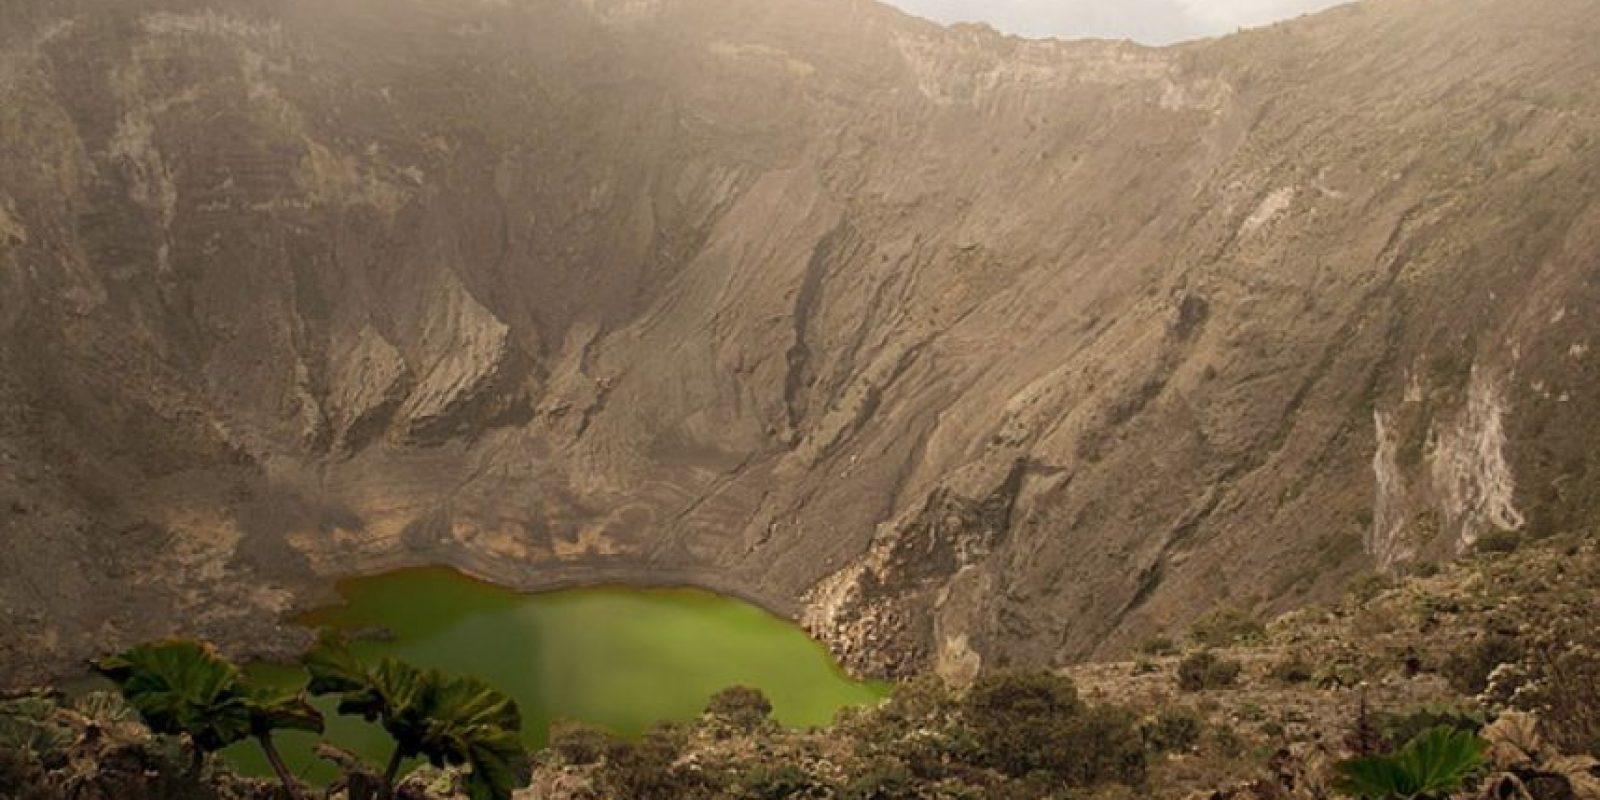 Lago del cráter del volcán Irazú, Costa rica Foto:Wikimedia